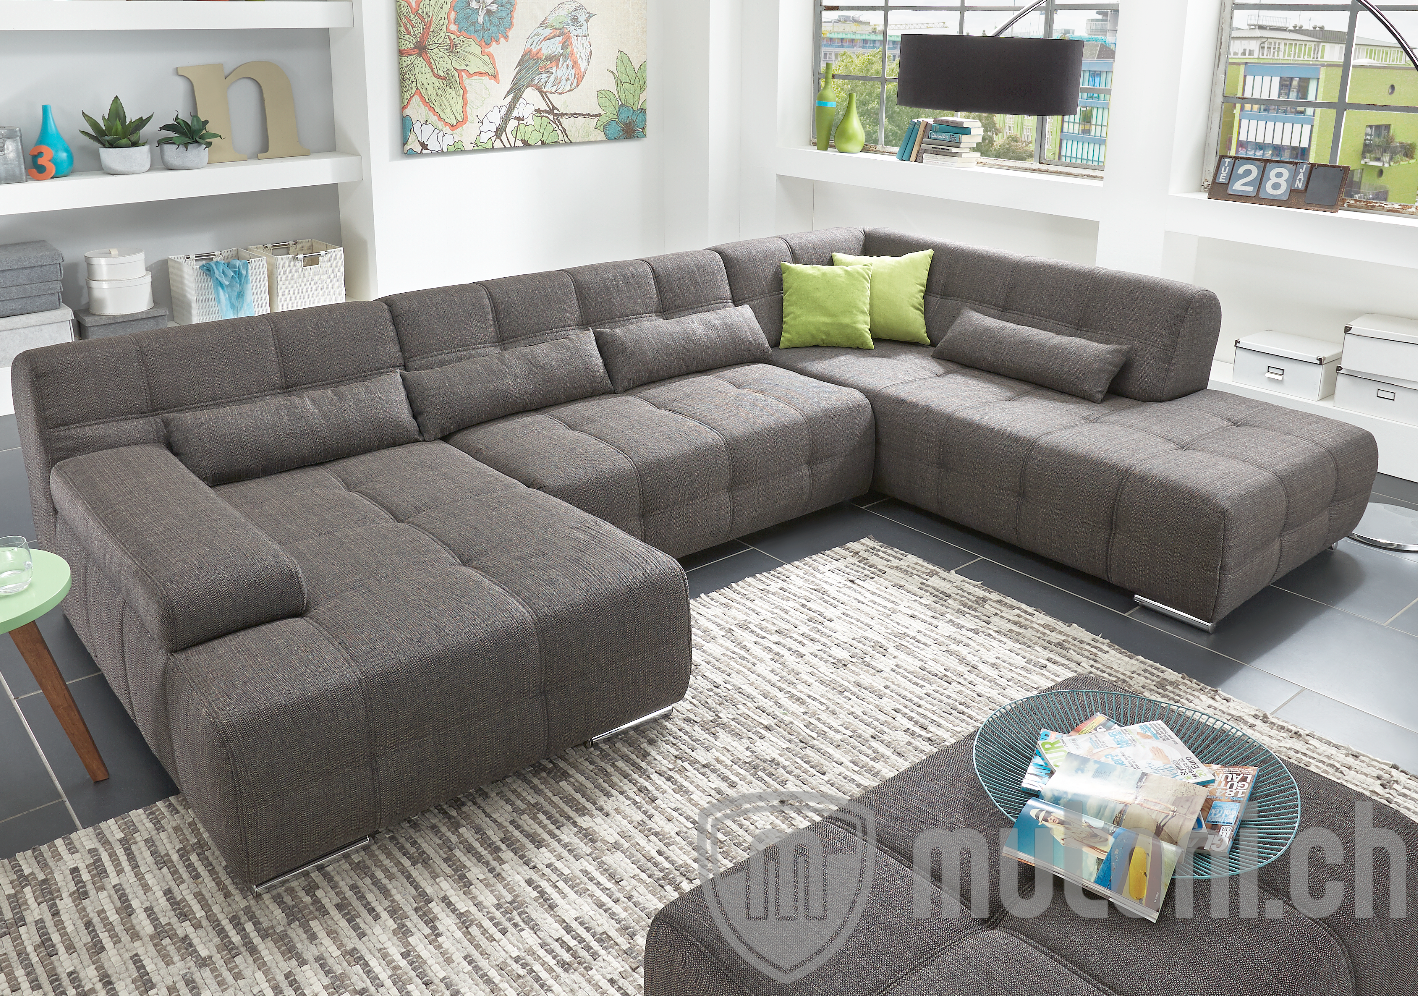 u sofa warner 173x344x231 in verschiedenen ausf hrungen mutoni design mutoni m bel. Black Bedroom Furniture Sets. Home Design Ideas